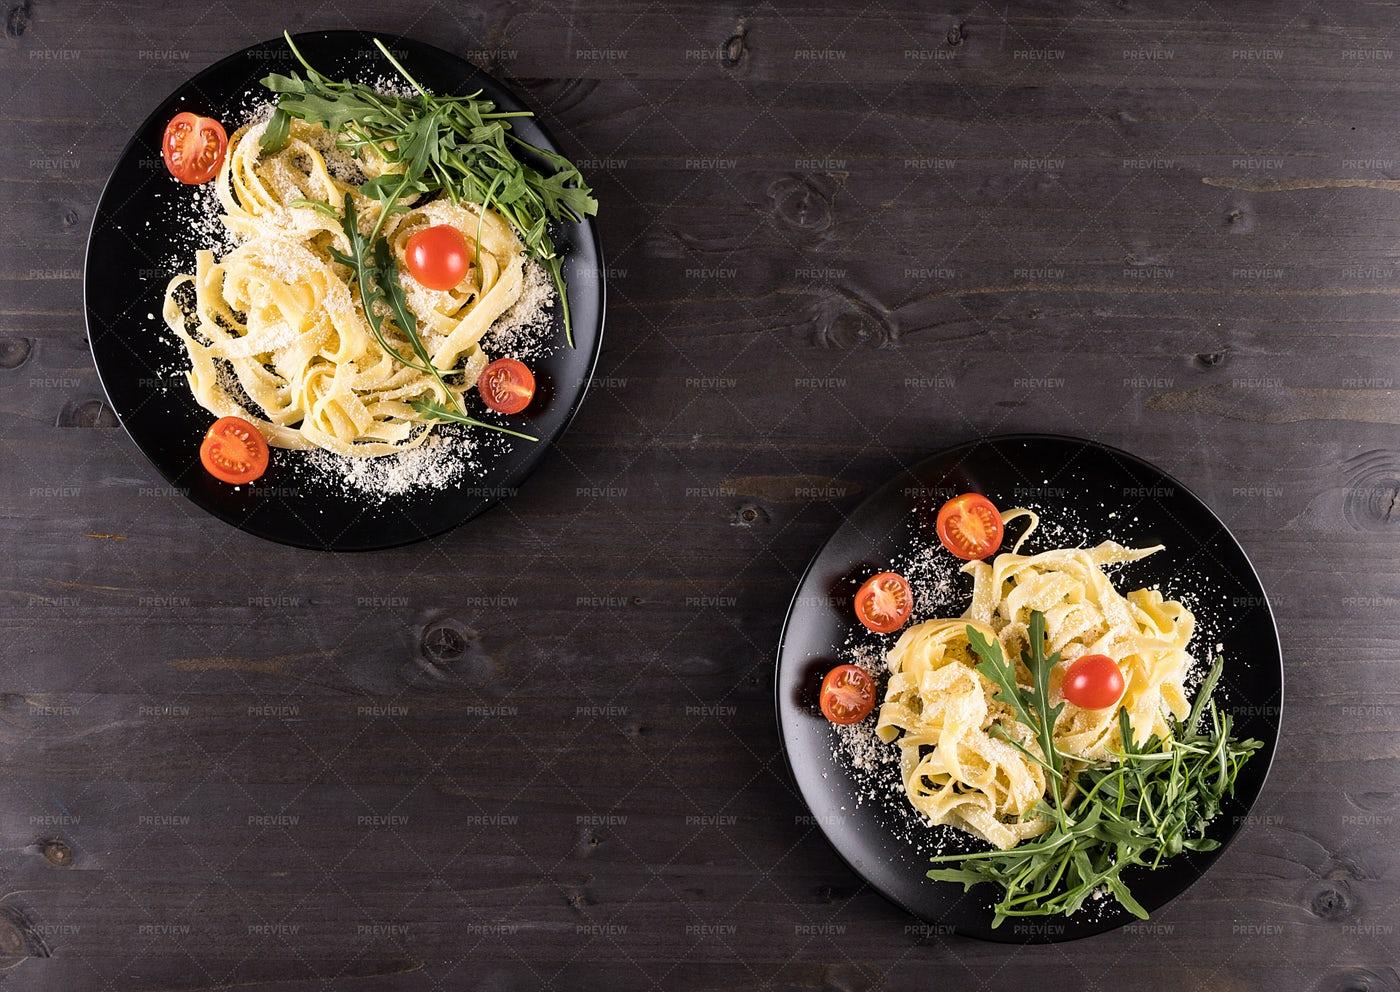 Black Plates With Pasta: Stock Photos